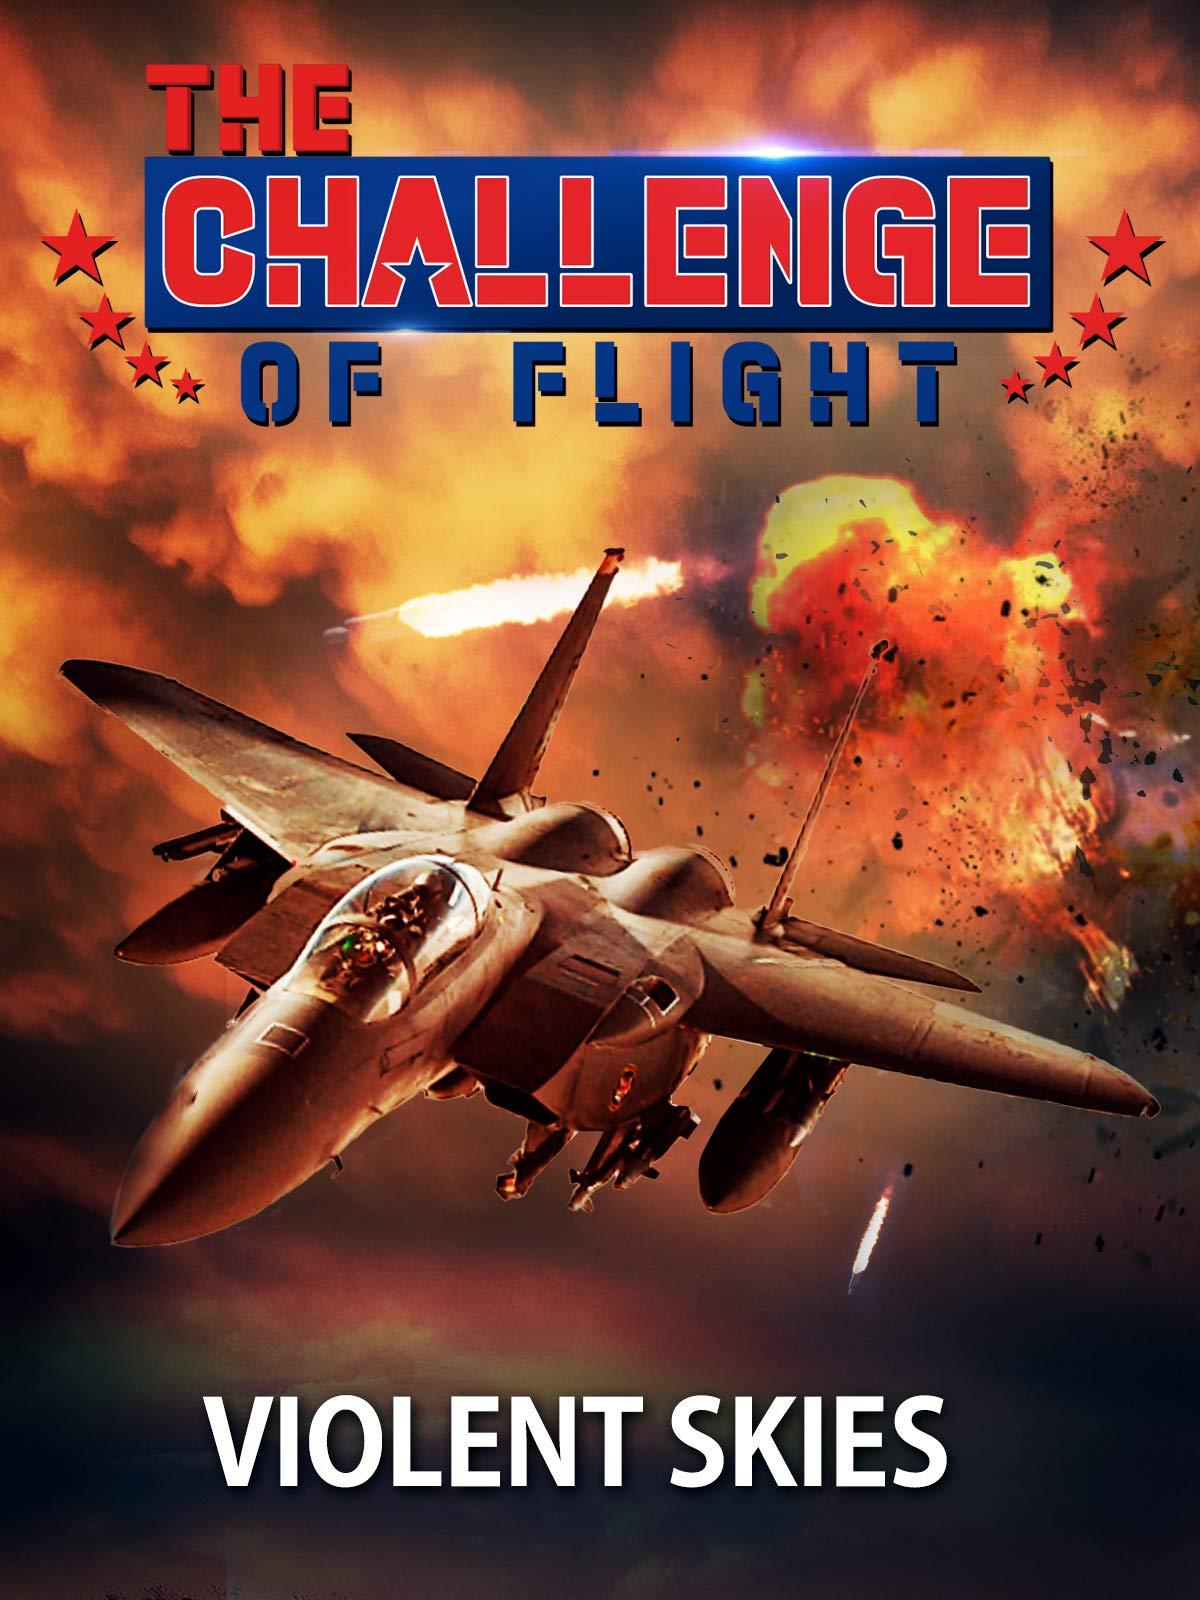 The Challenge of Flight - Violent Skies